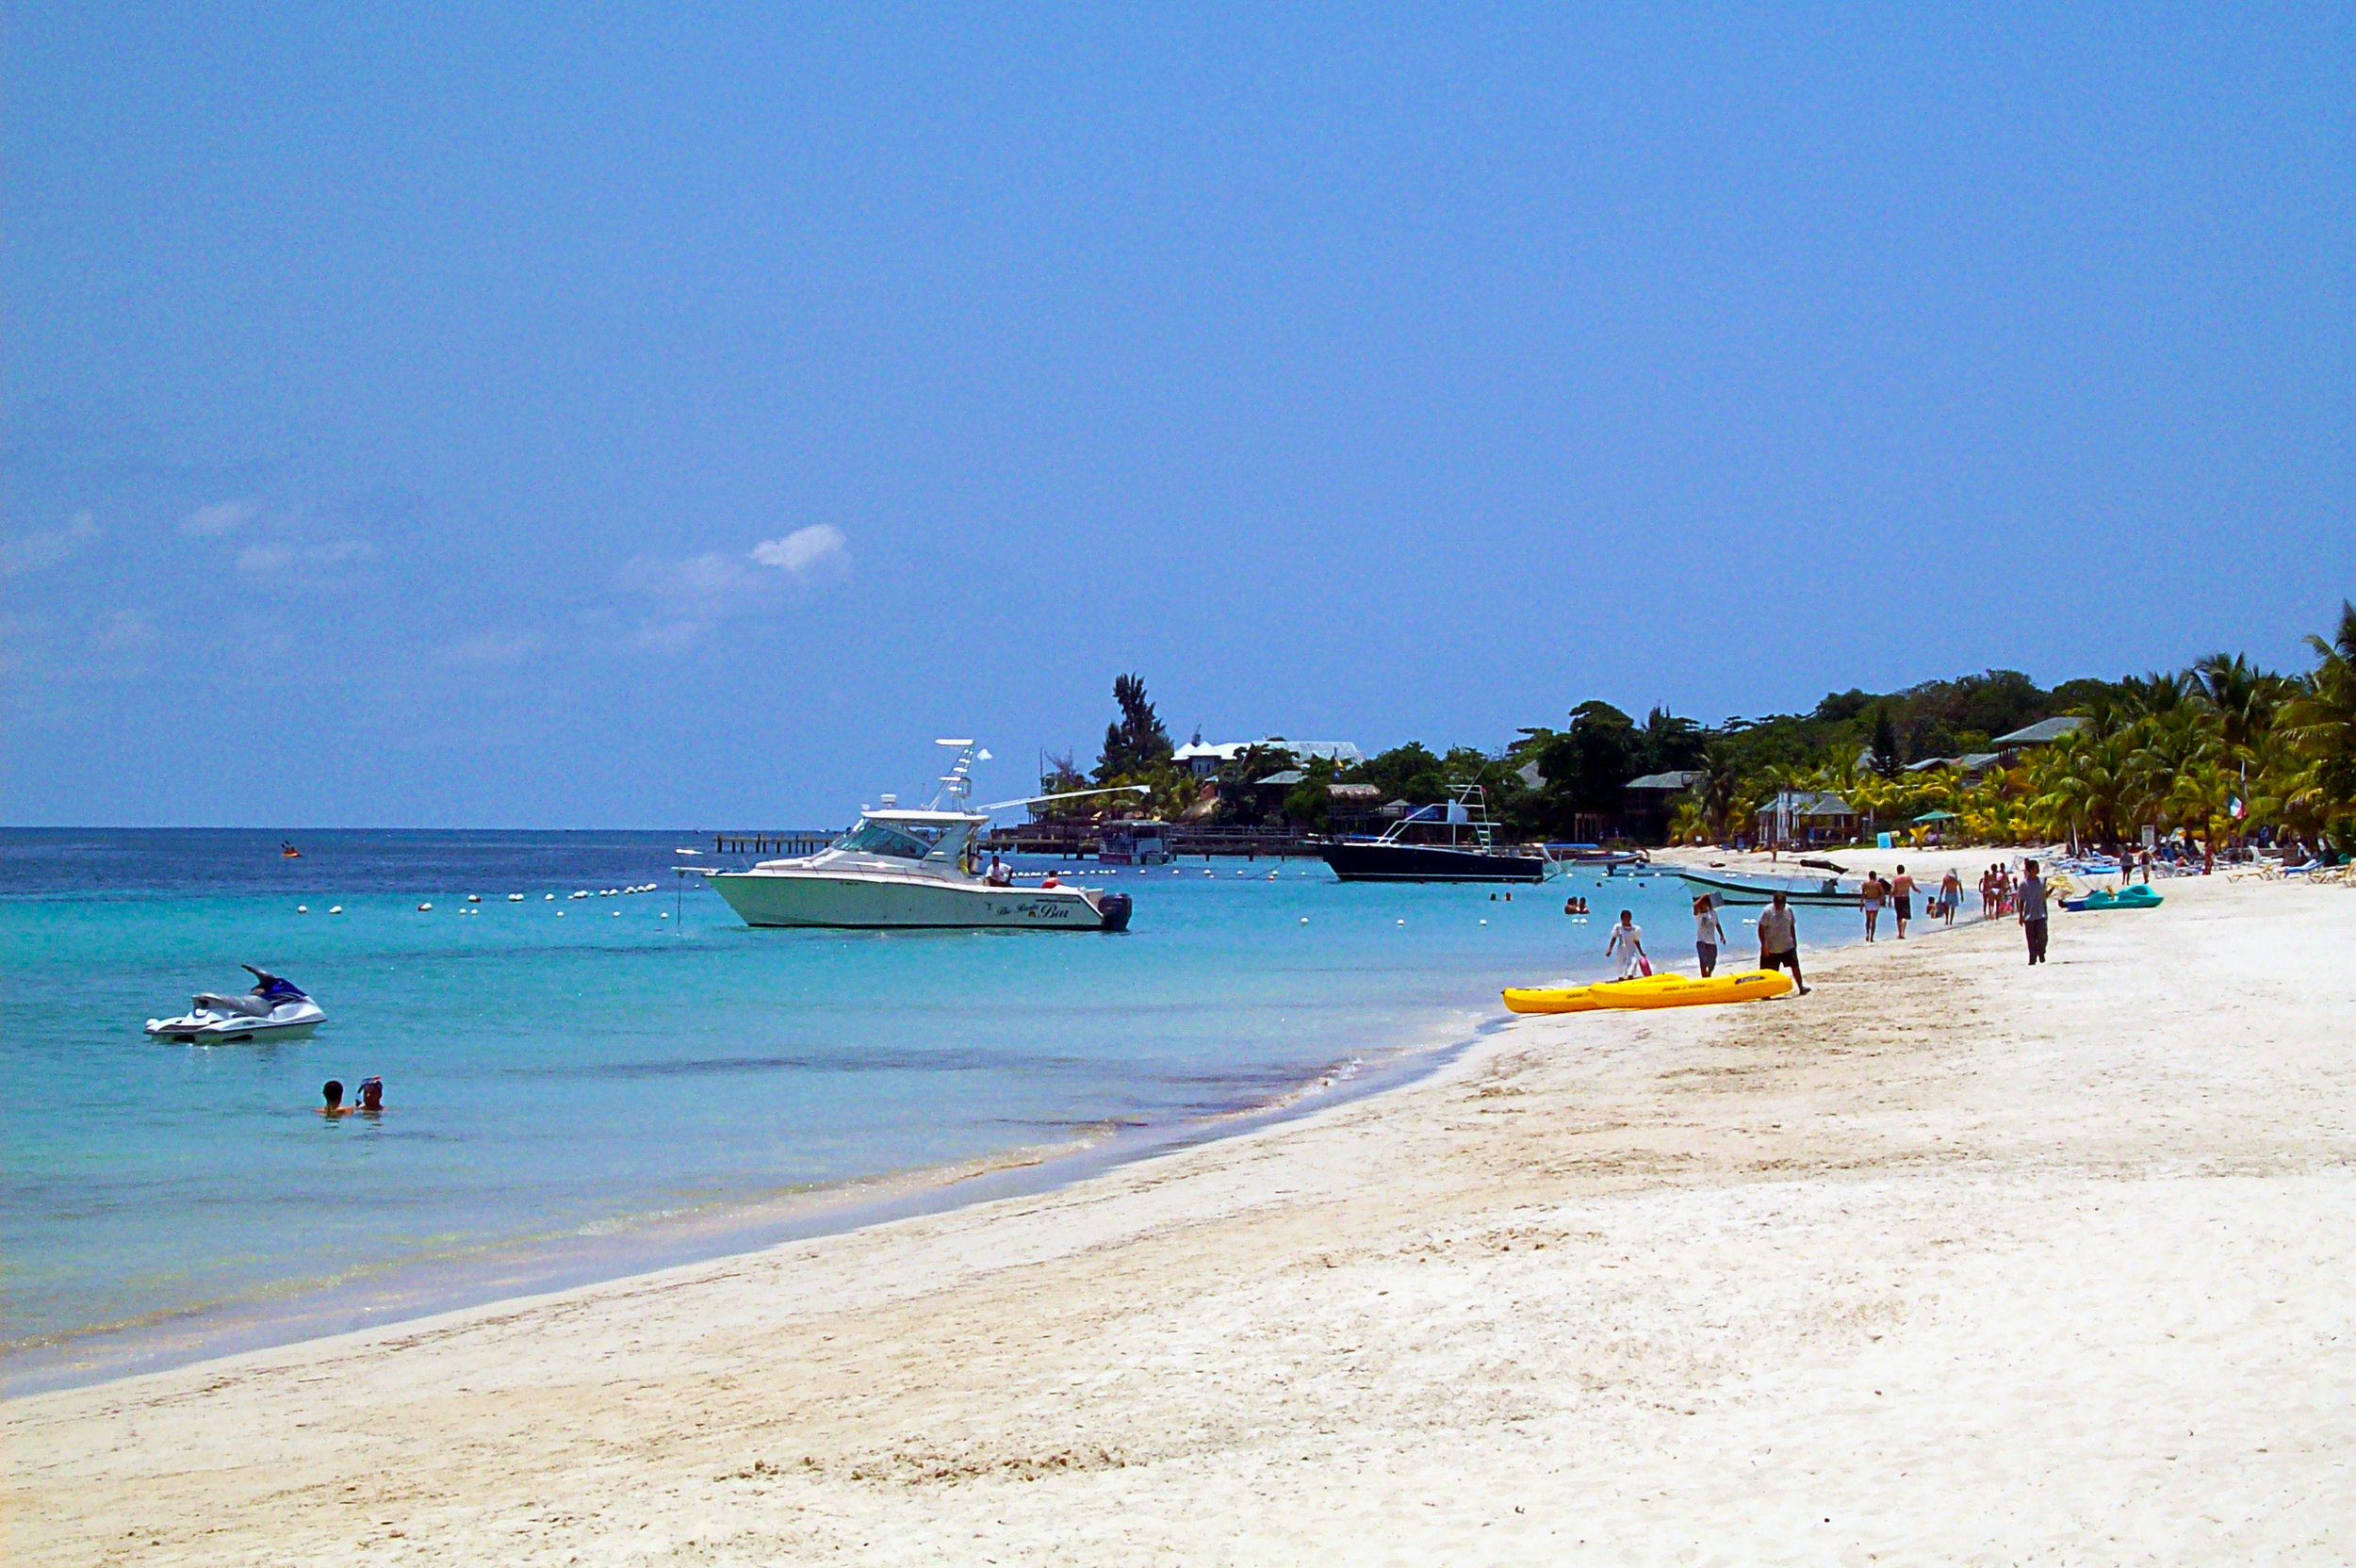 West_Bay_Beach_-Roatan_-Honduras-23May2009-g.jpg